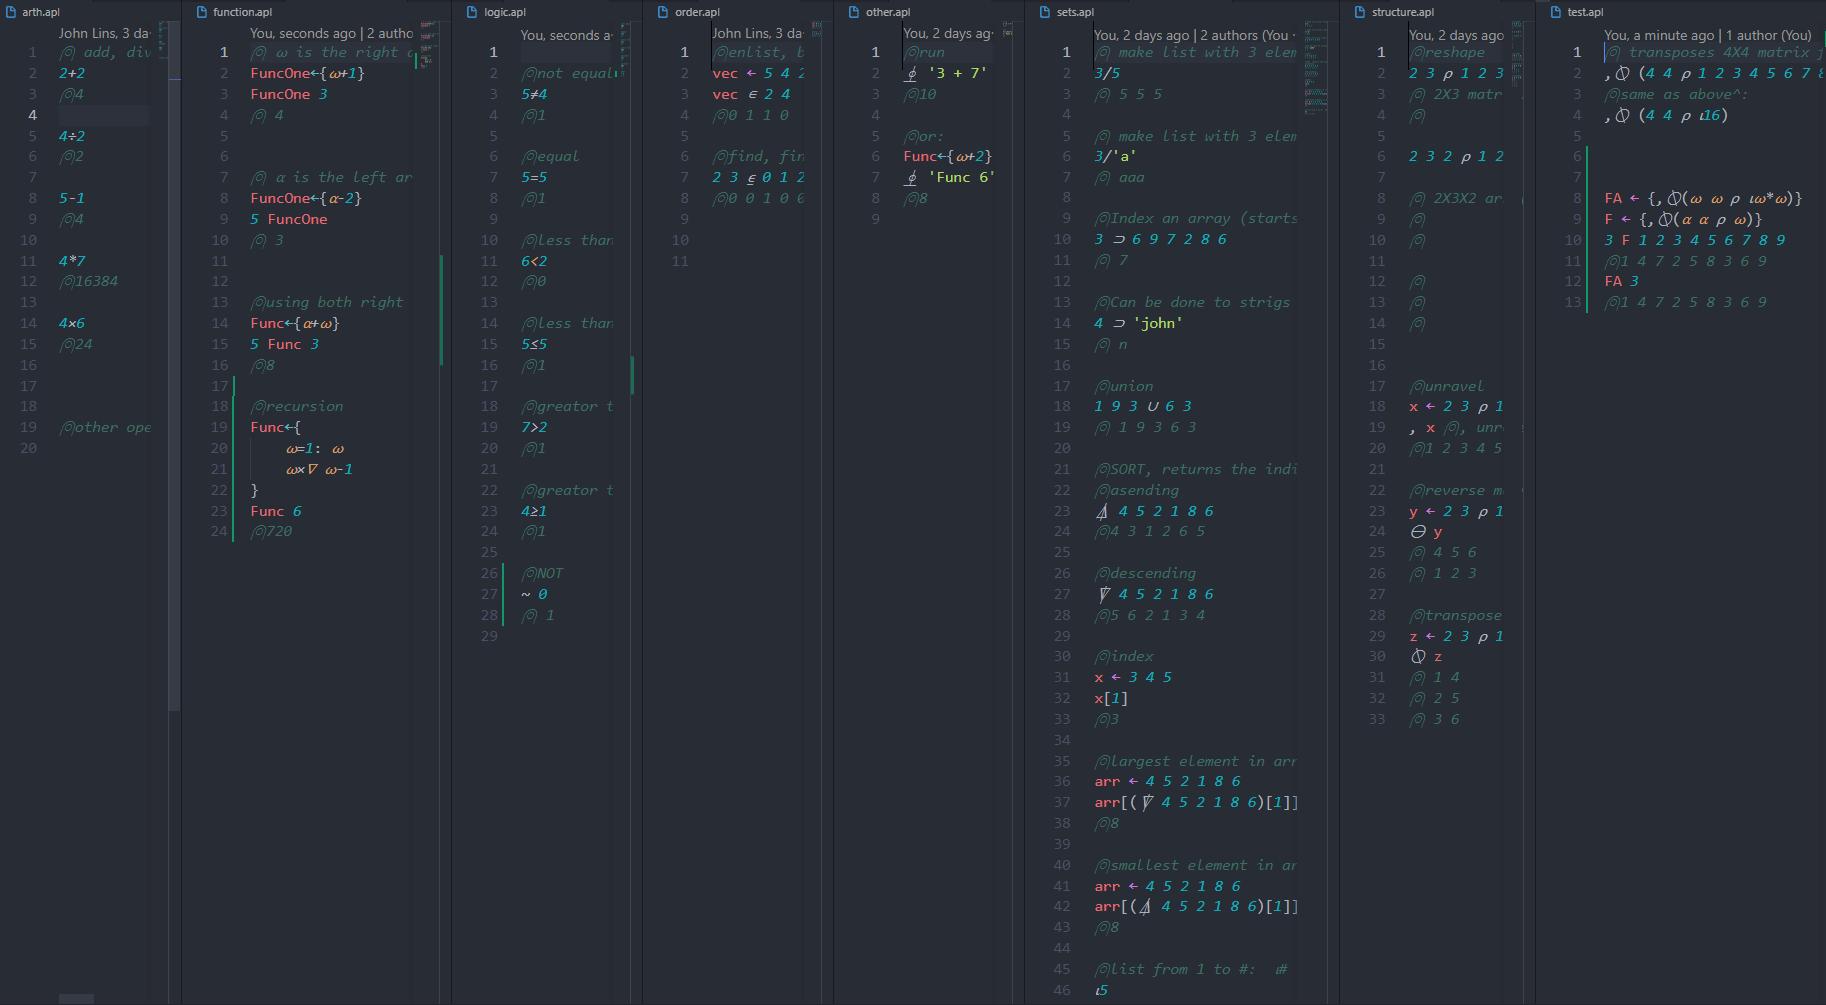 https://cloud-2jg44r6qn-hack-club-bot.vercel.app/0image.png